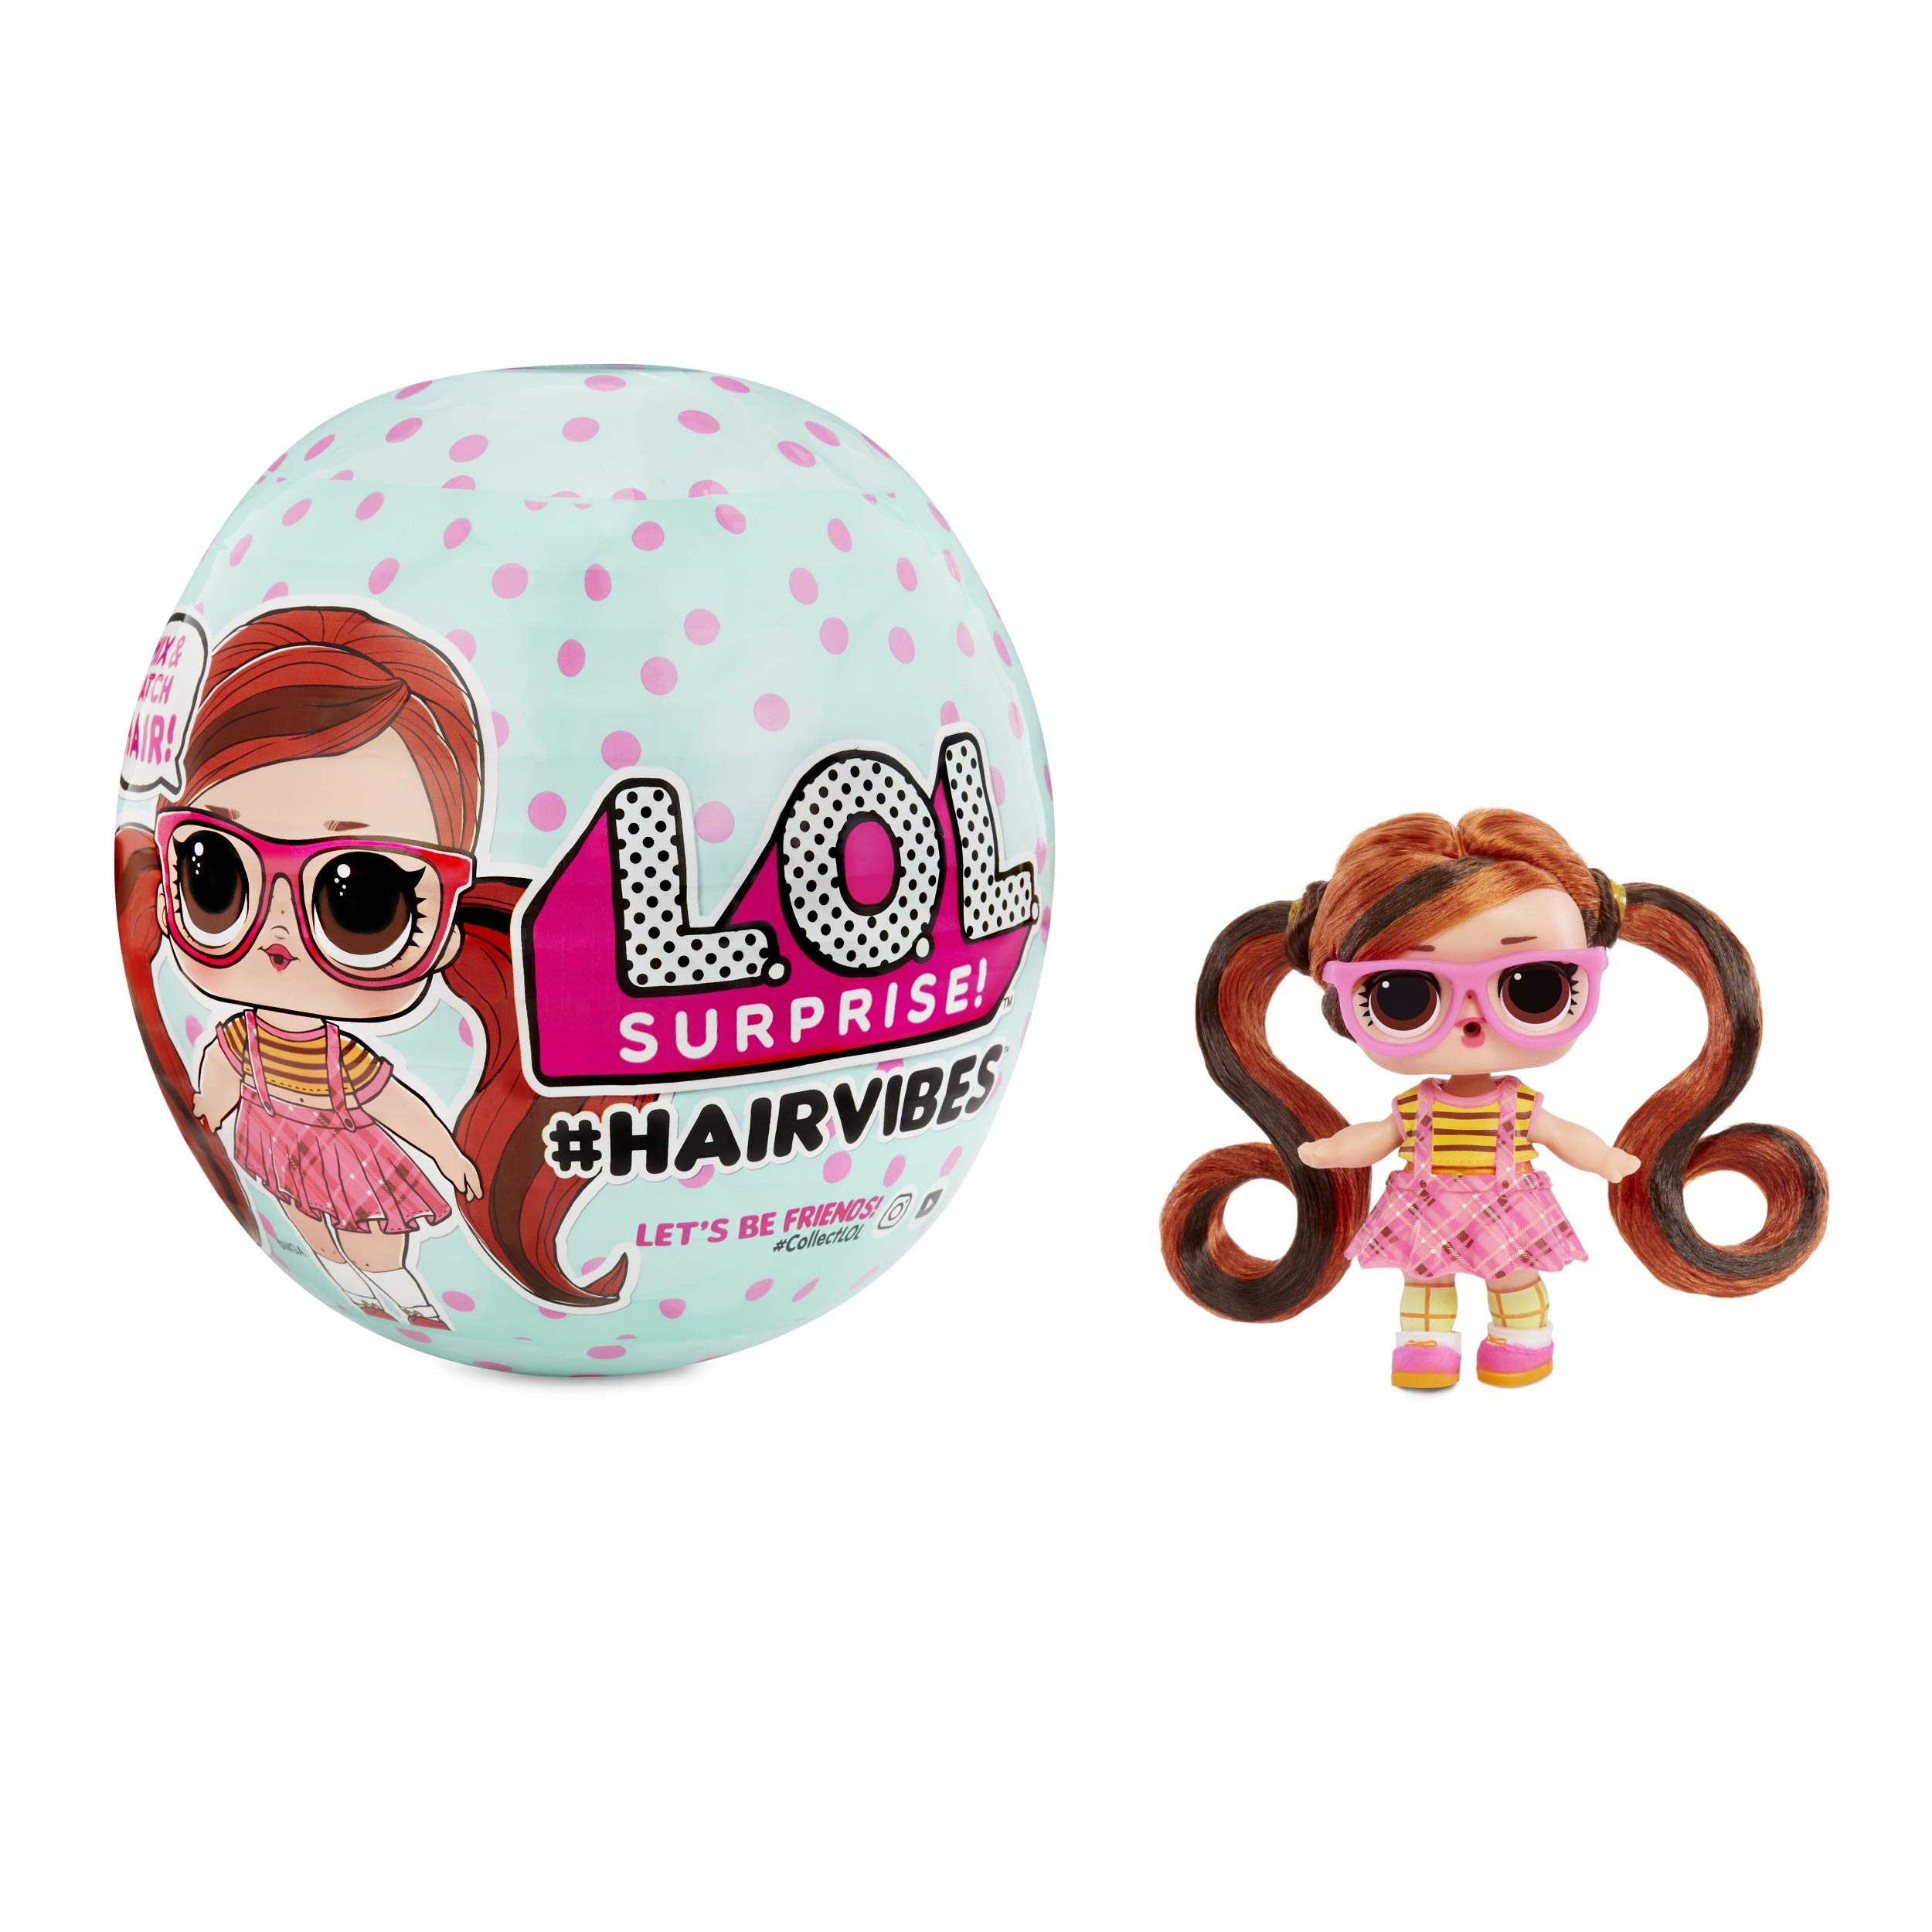 L.O.L 서프라이즈 헤어바이브 돌스 L.O.L Surprise! Hairvibes Dolls with 15 Surprises & Mix & Match Hairpieces